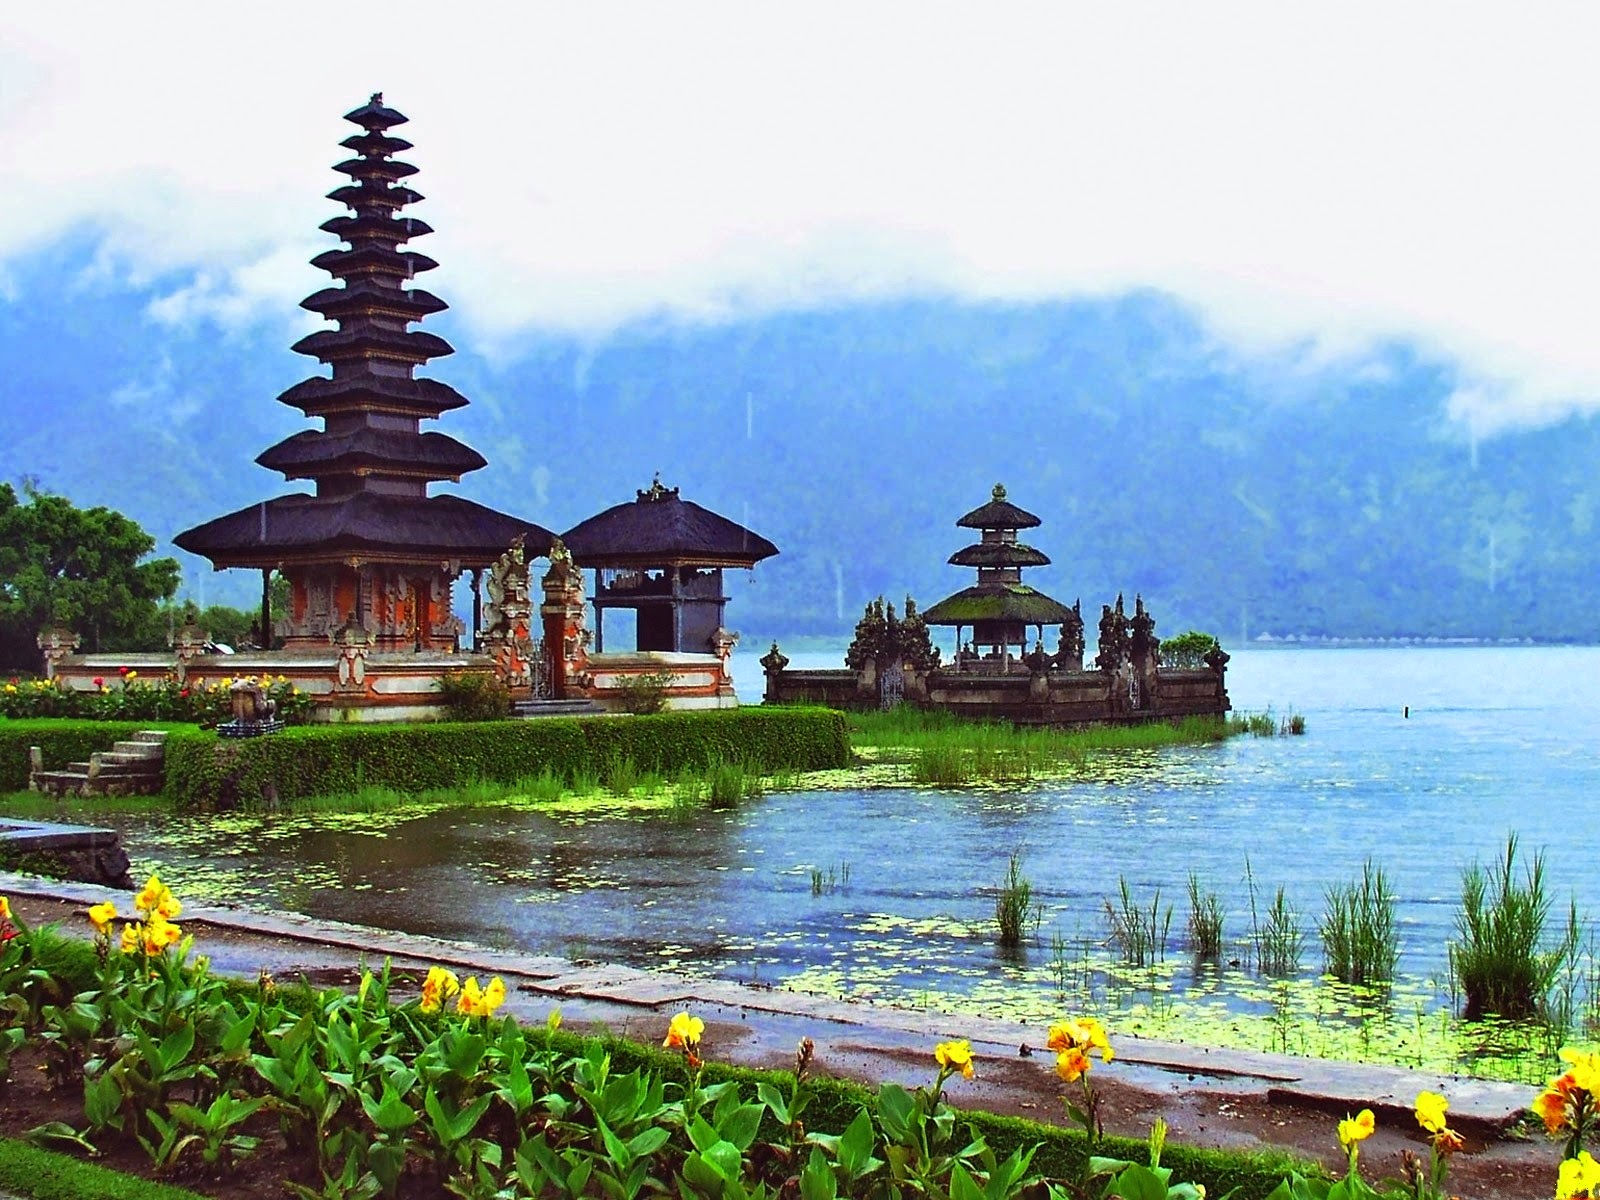 fixedw_large_2x Eat Pray Love Bali